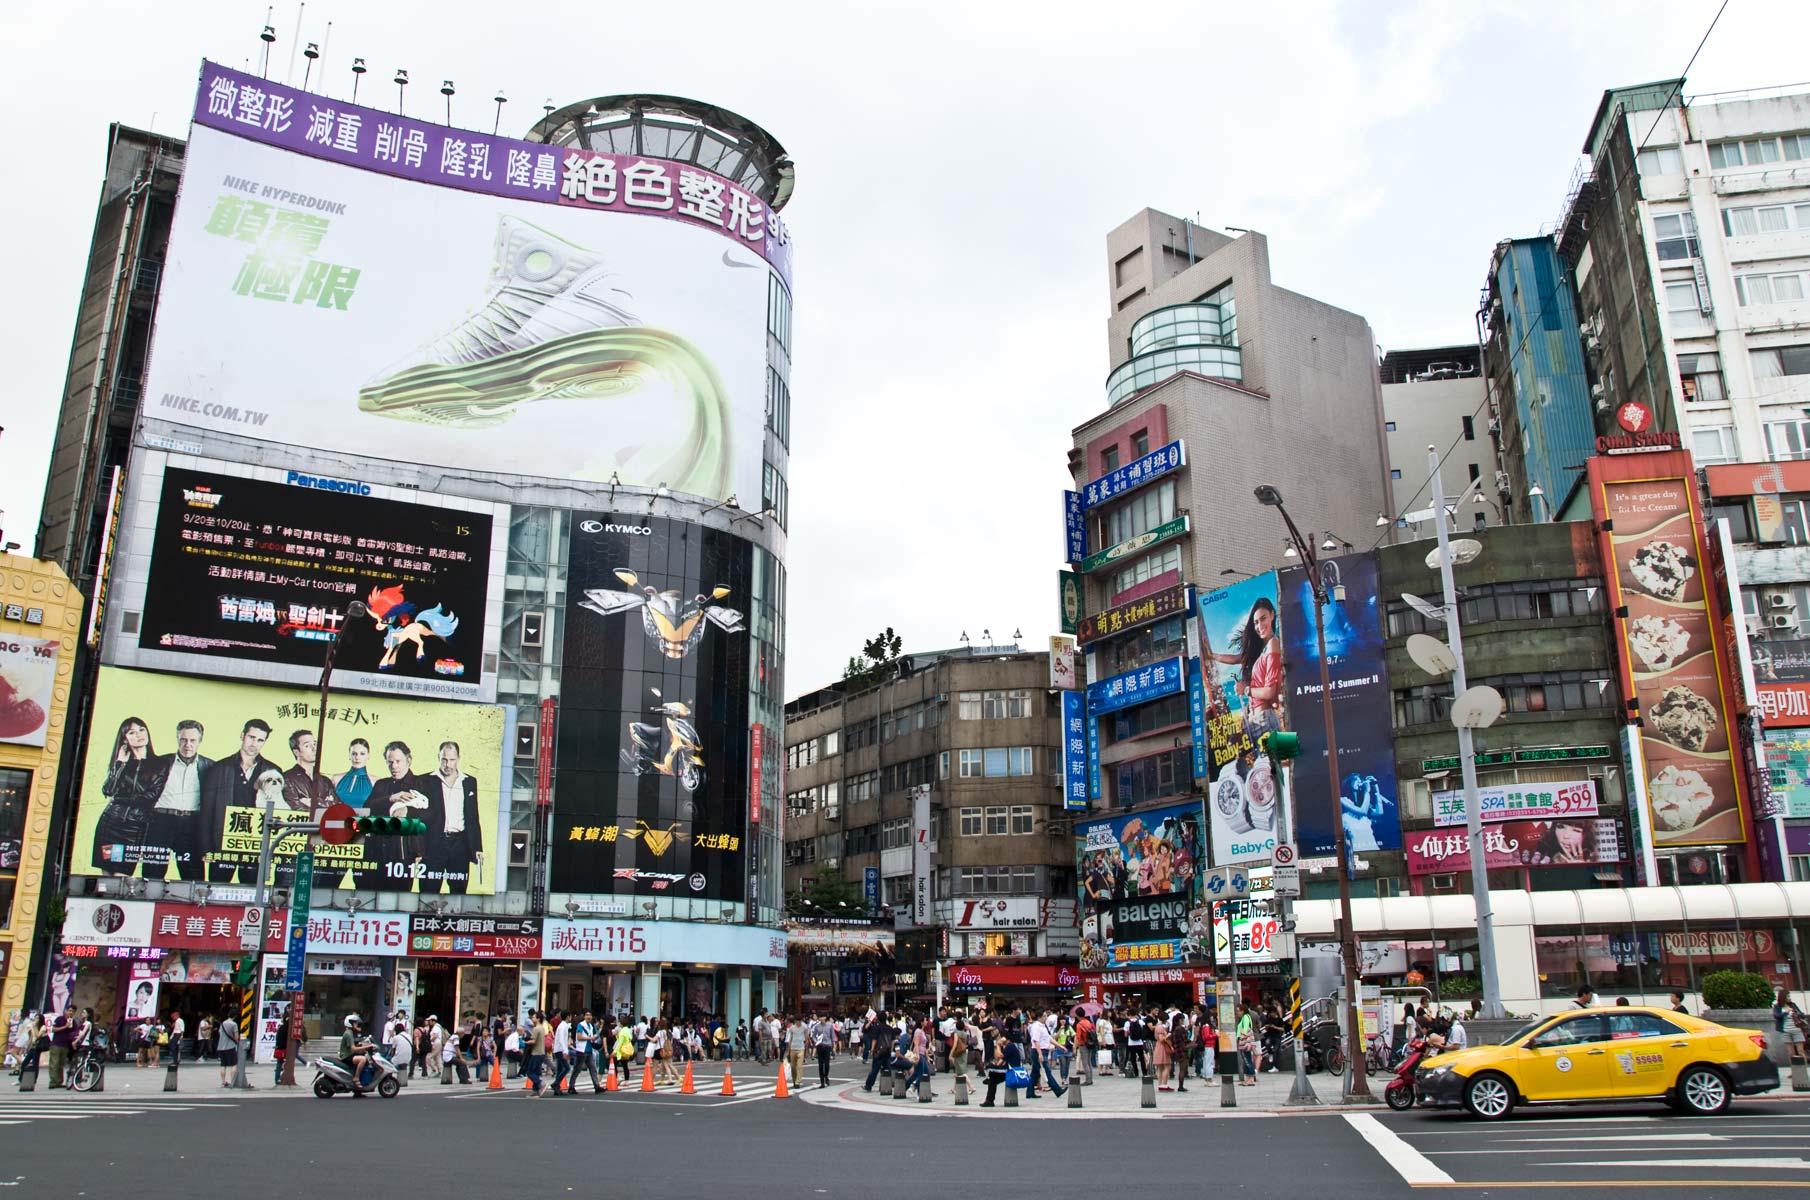 Vergnügungsviertel Ximending in Taipei, Taiwan